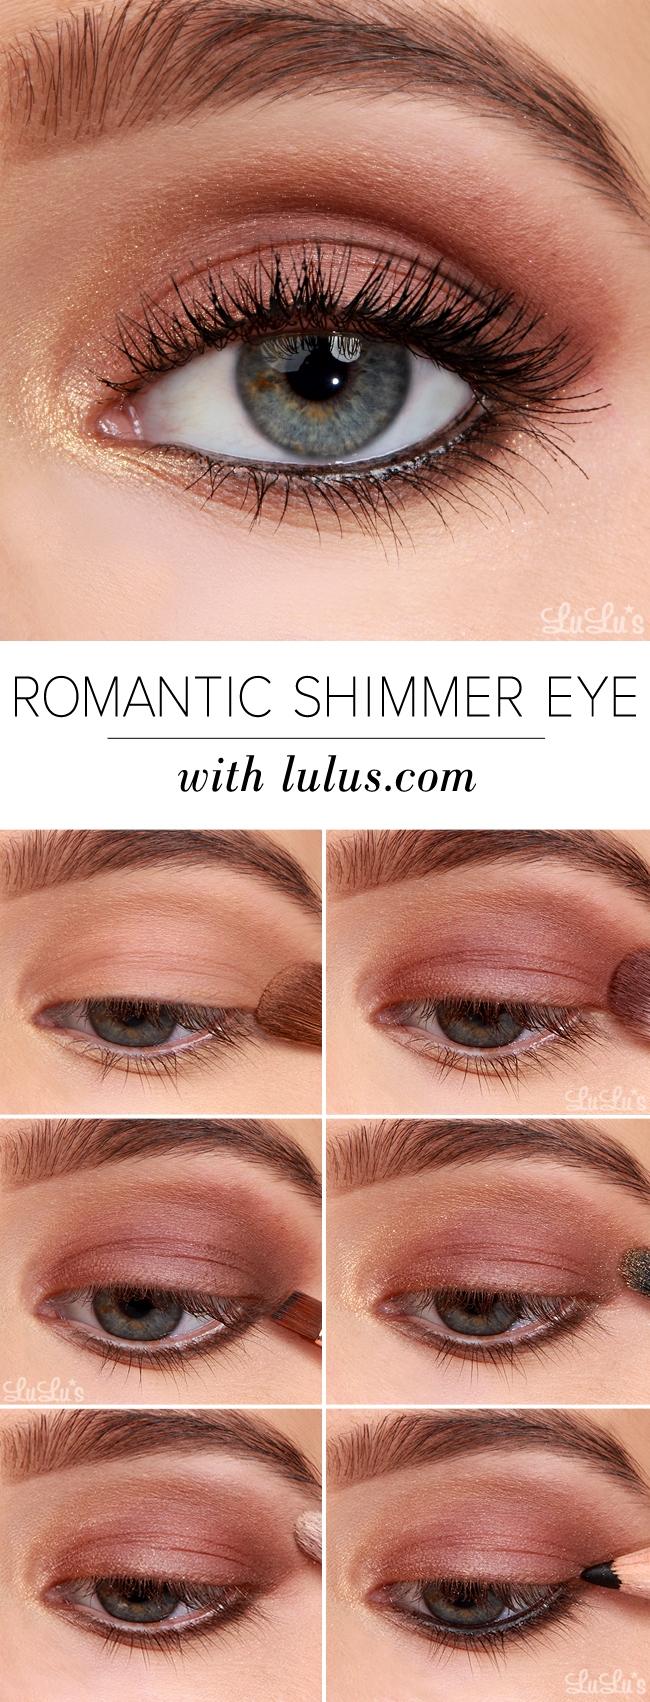 romantic-shimmer-eye-makeup-